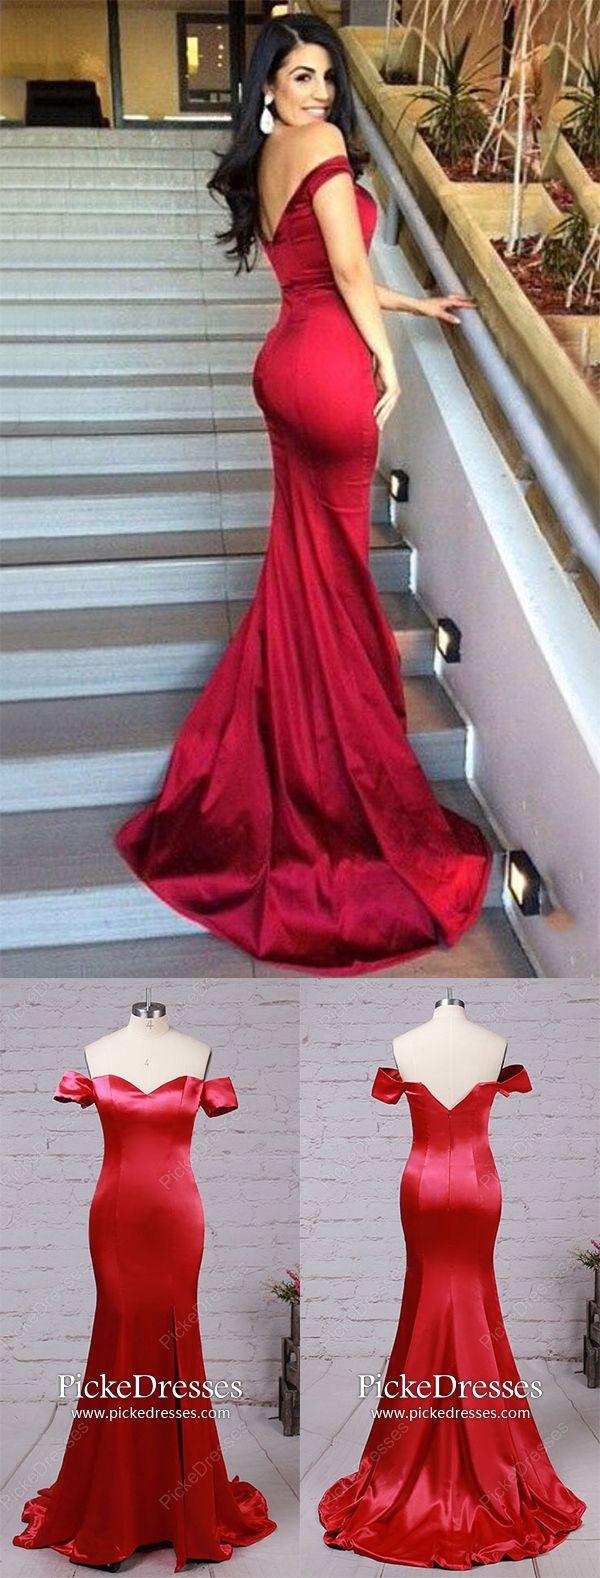 Burgundy prom dresses long mermaid formal dresses with slit simple